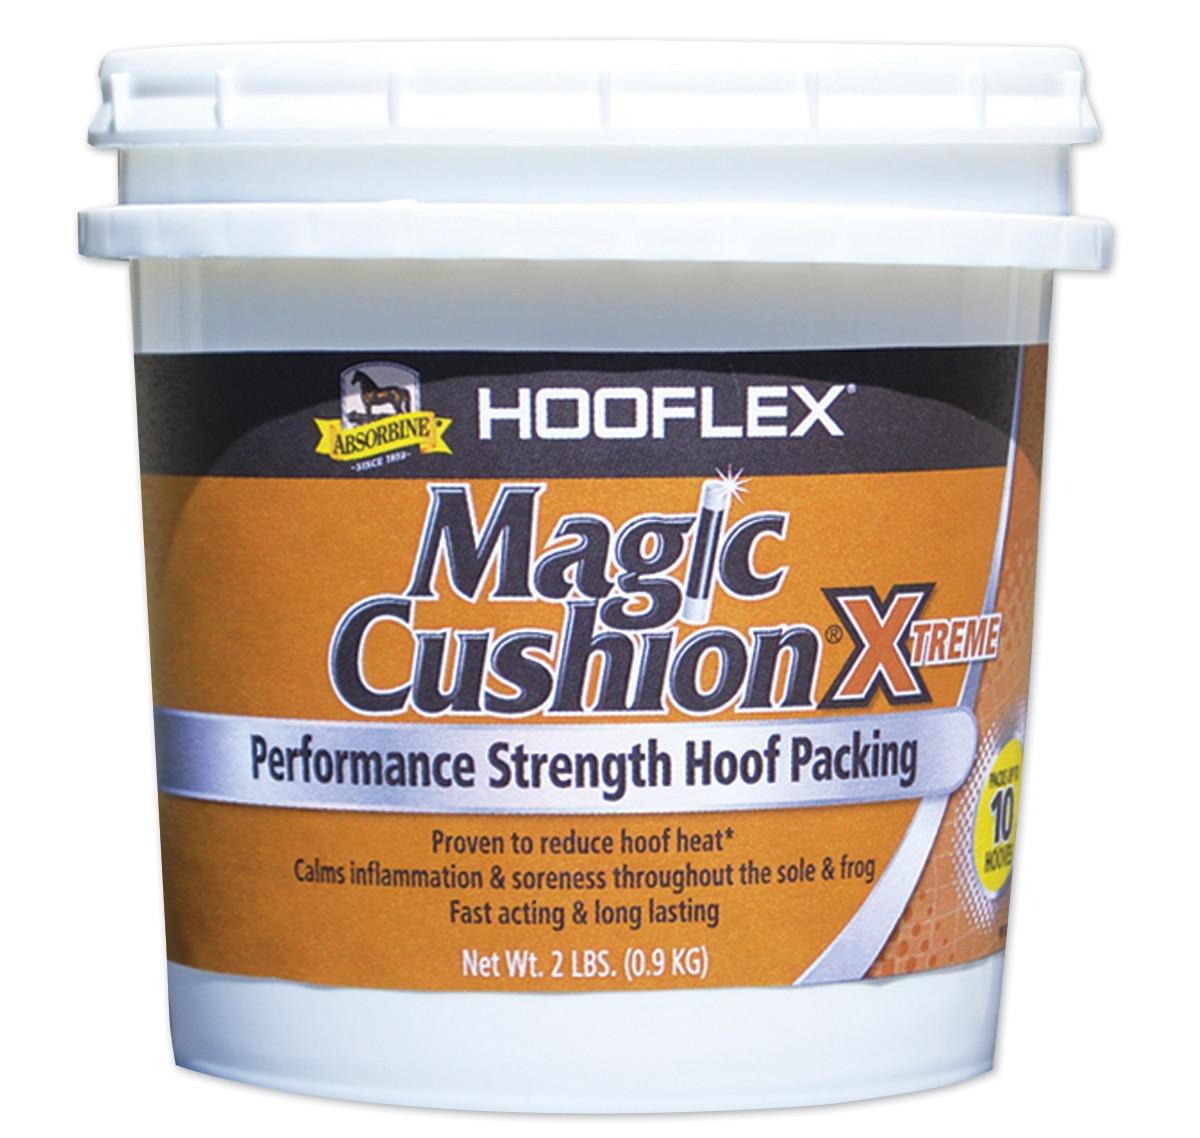 Magic Cushion Xtreme Hoof Packing